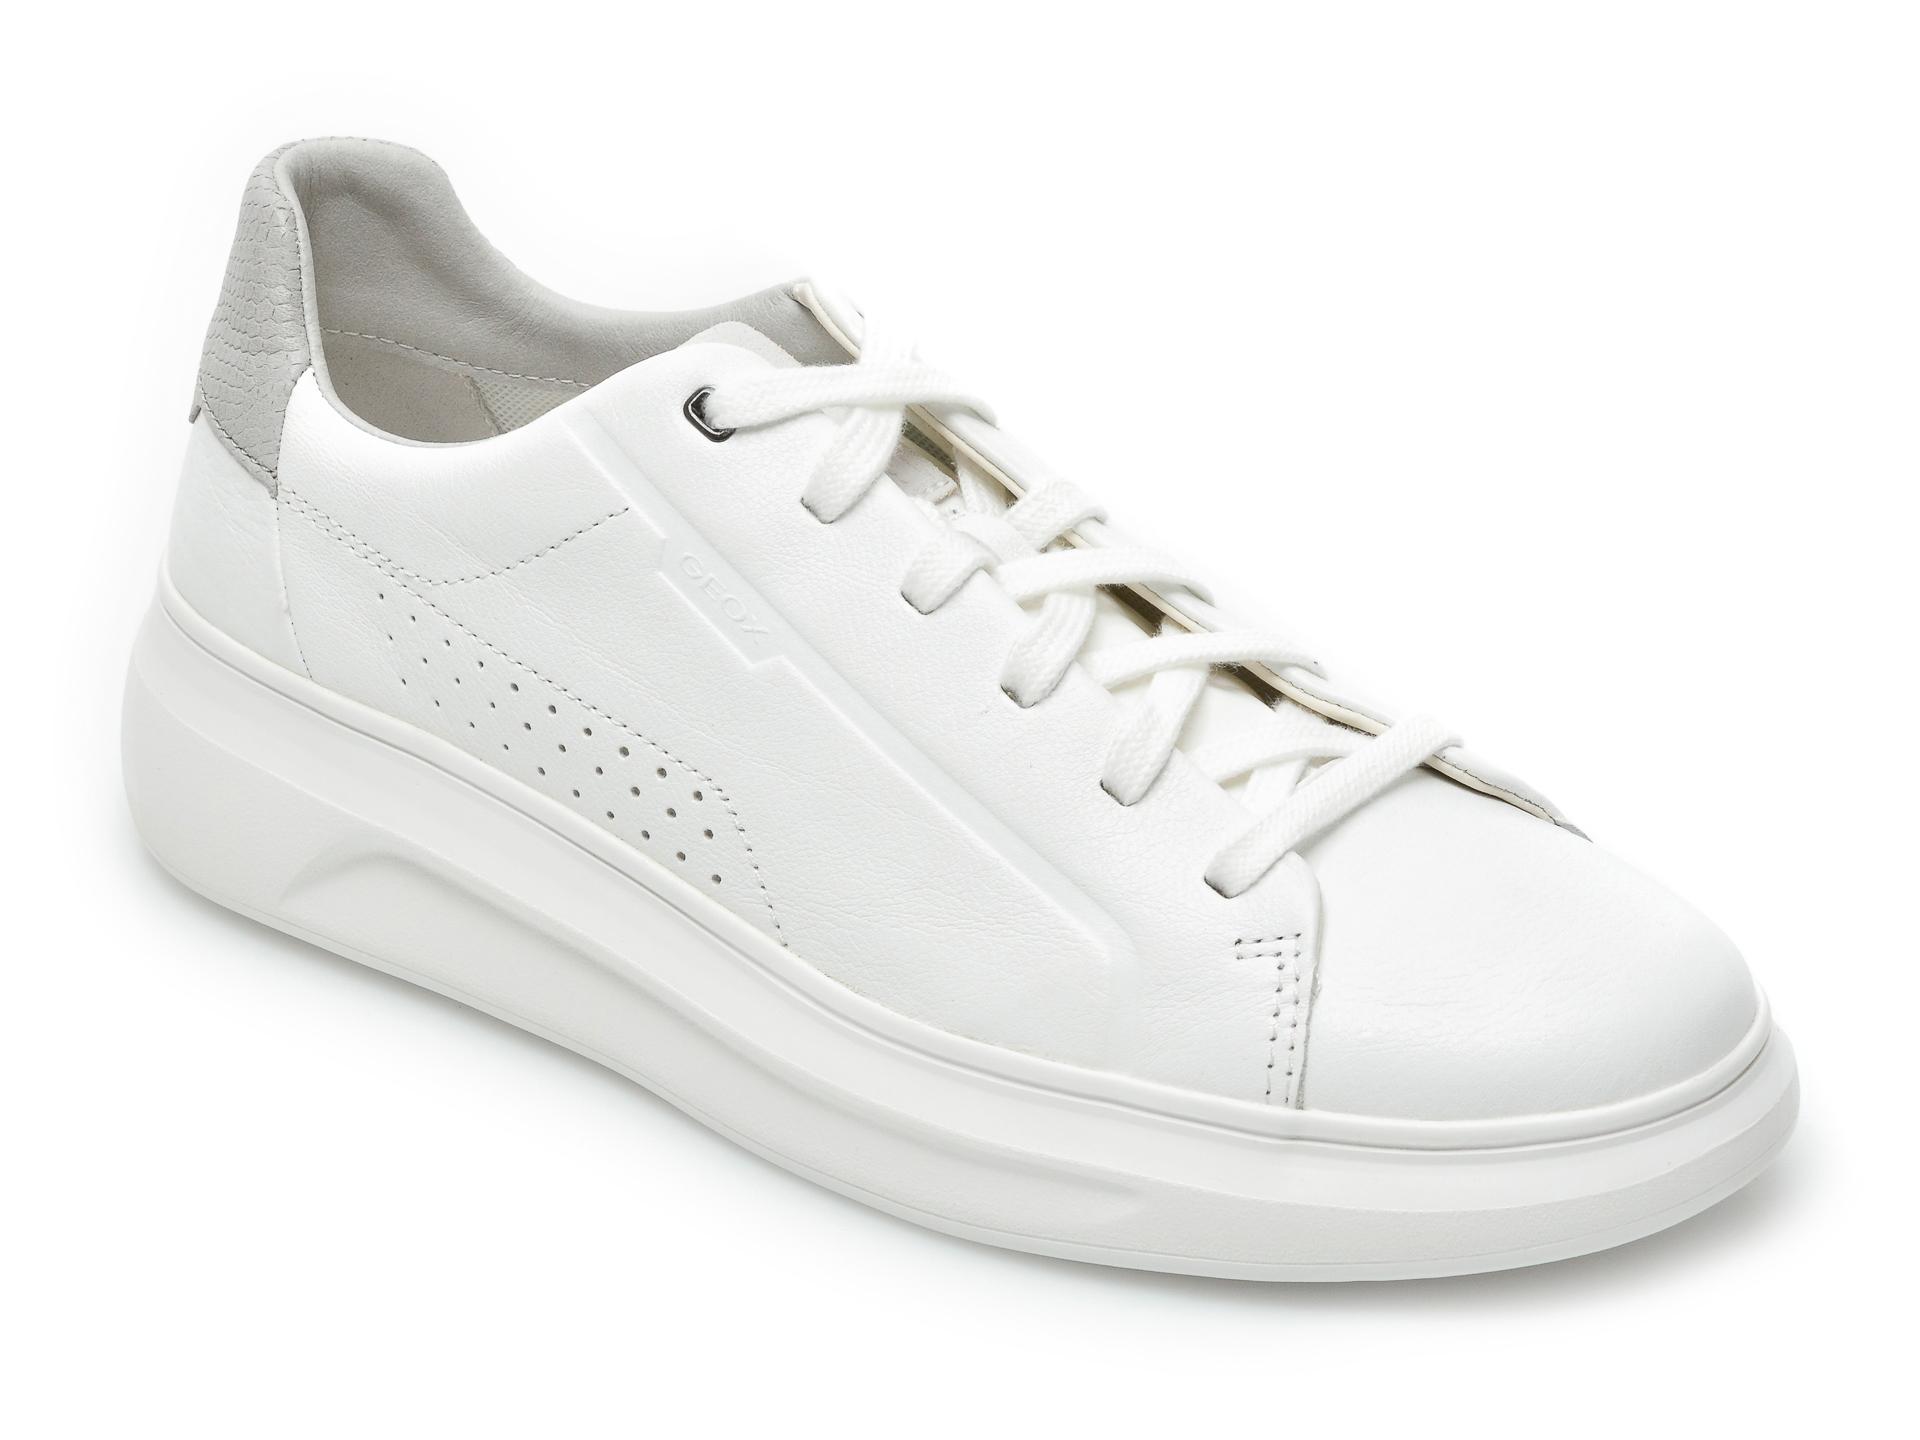 Pantofi sport GEOX albi, U15ATB, din piele naturala imagine